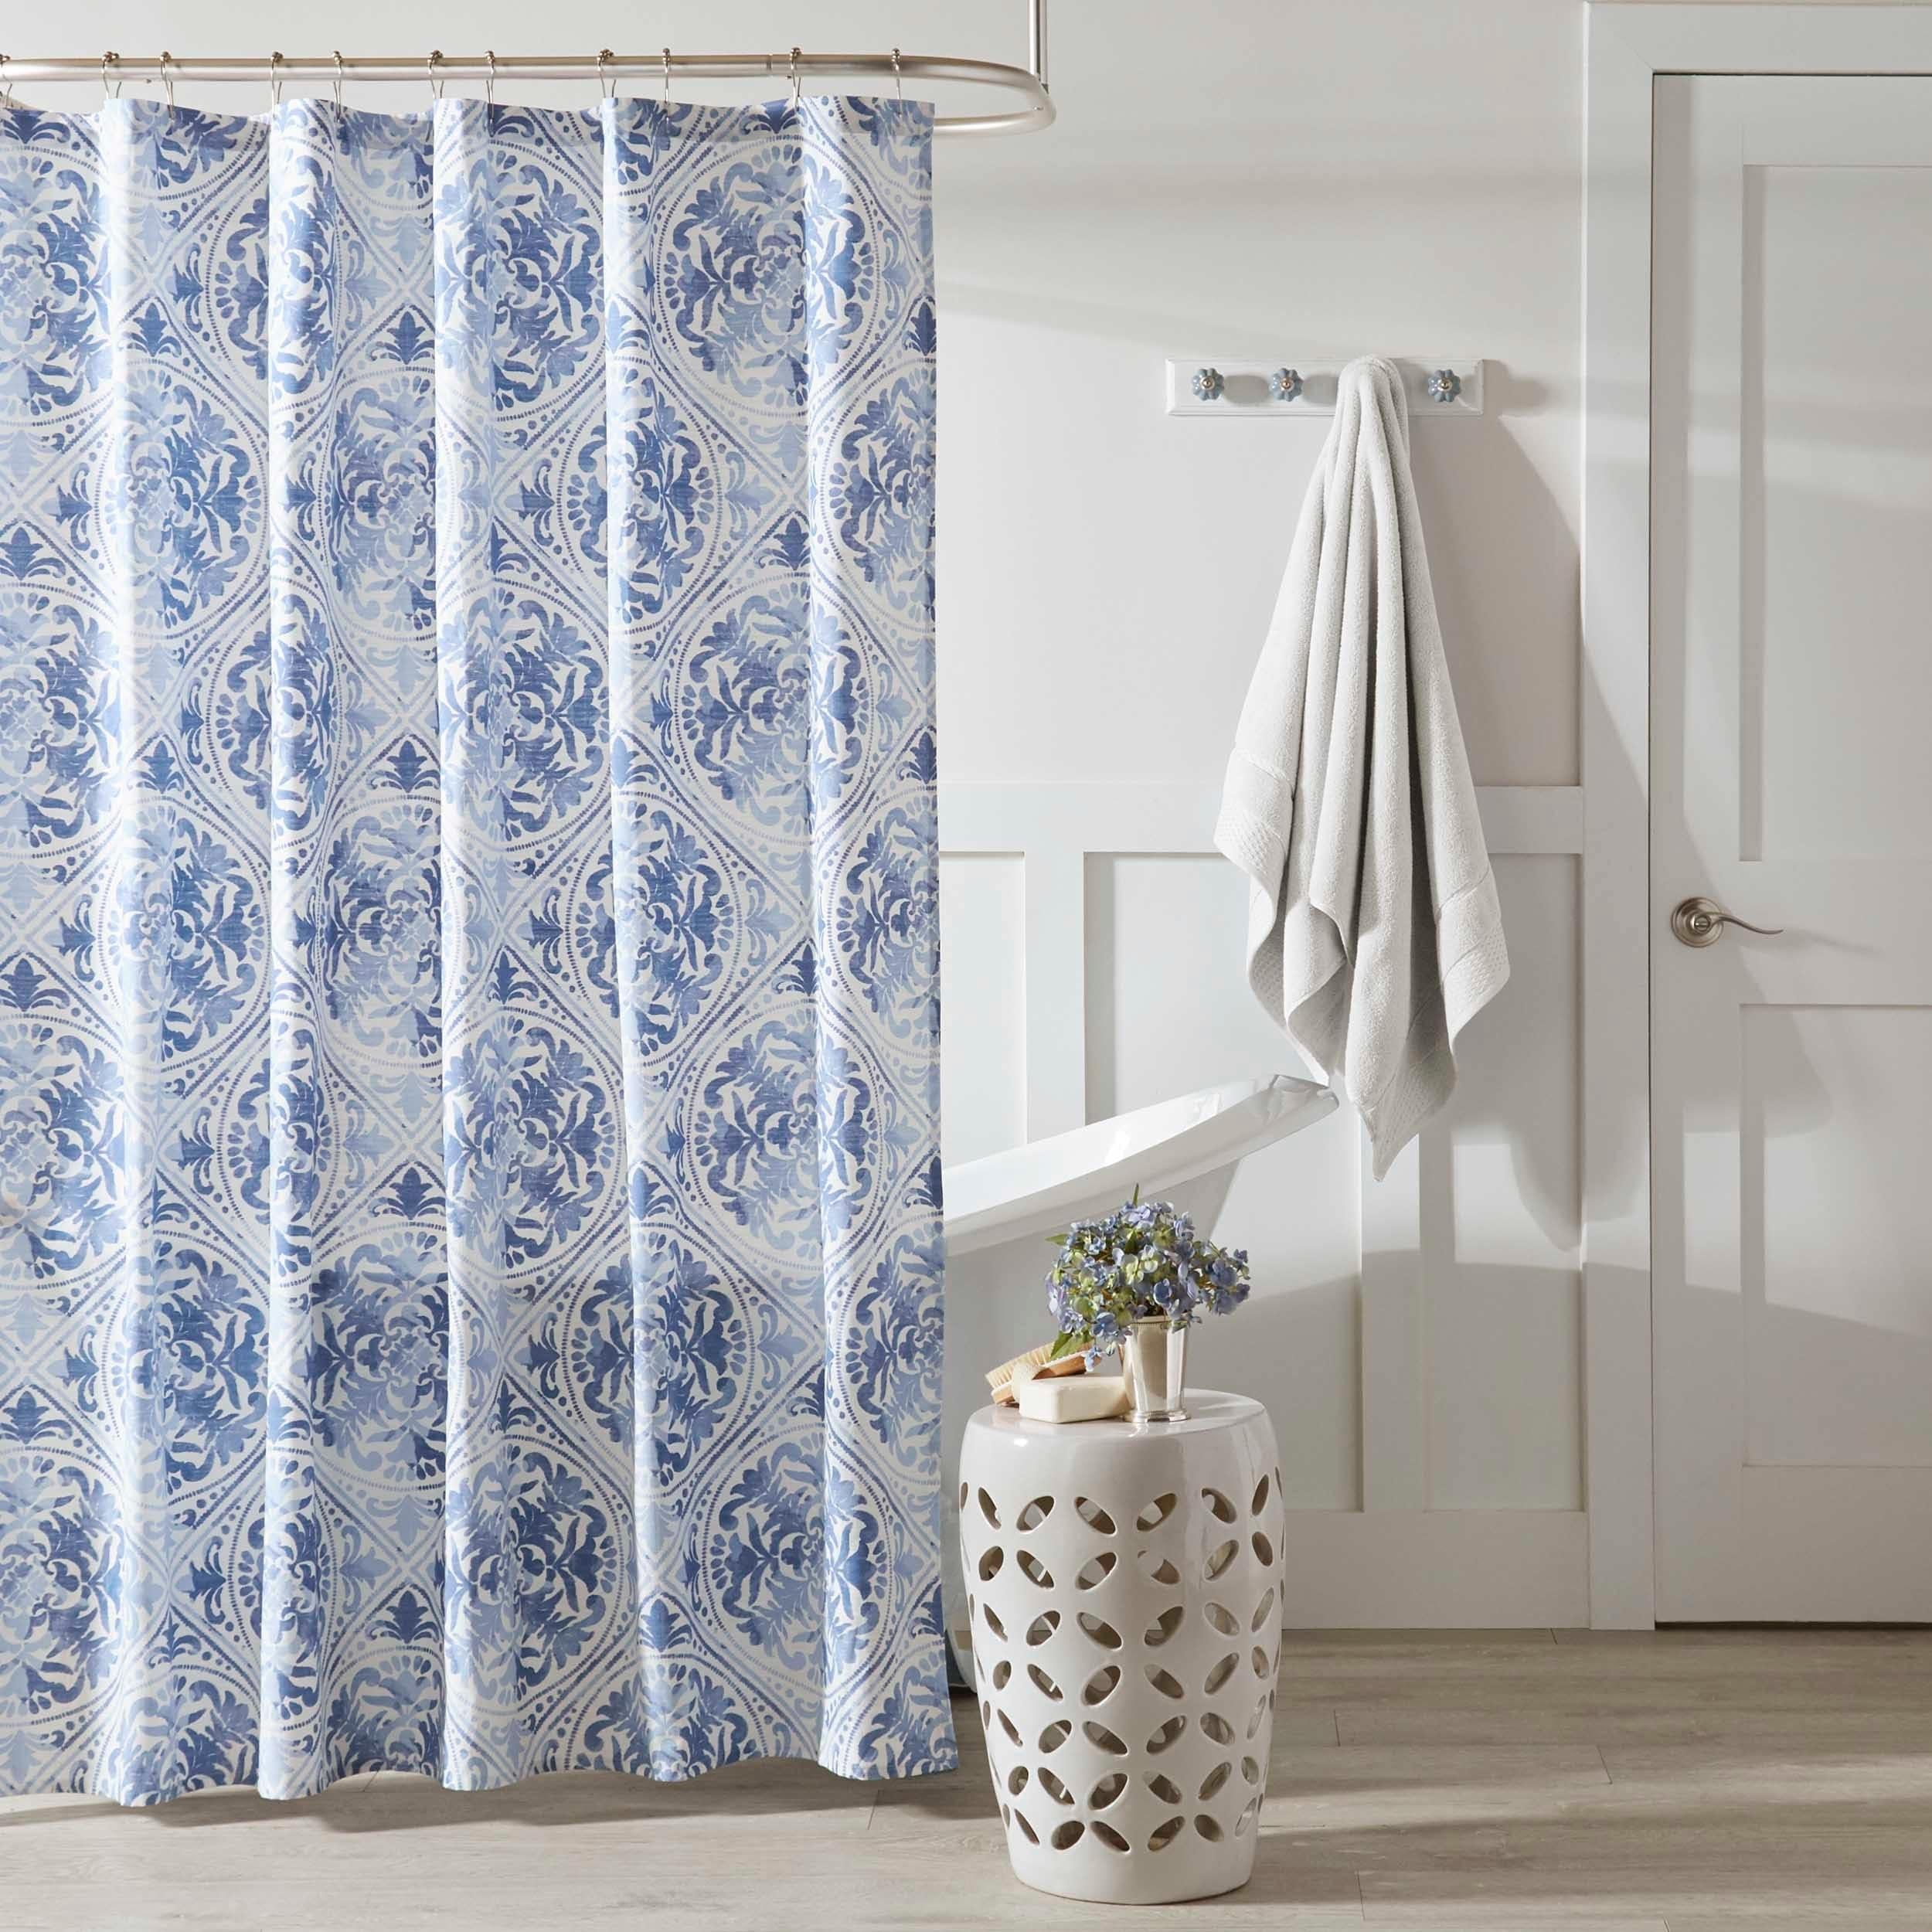 Shop Laura Ashley Mila Shower Curtain